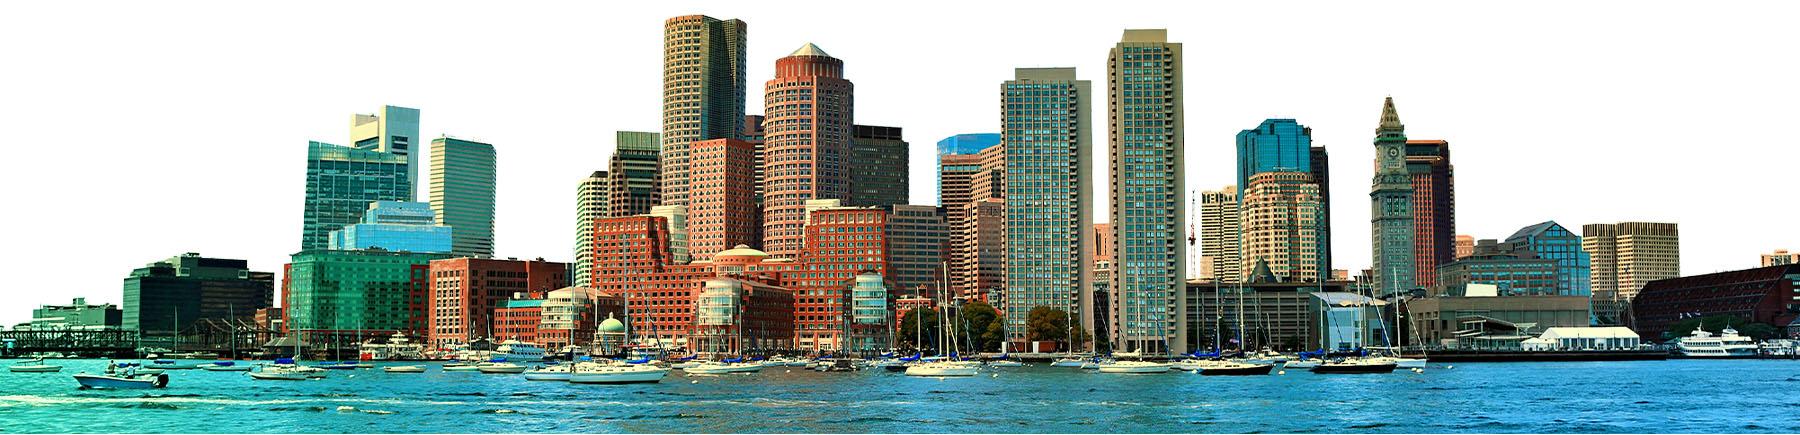 Photo of the Boston skyline